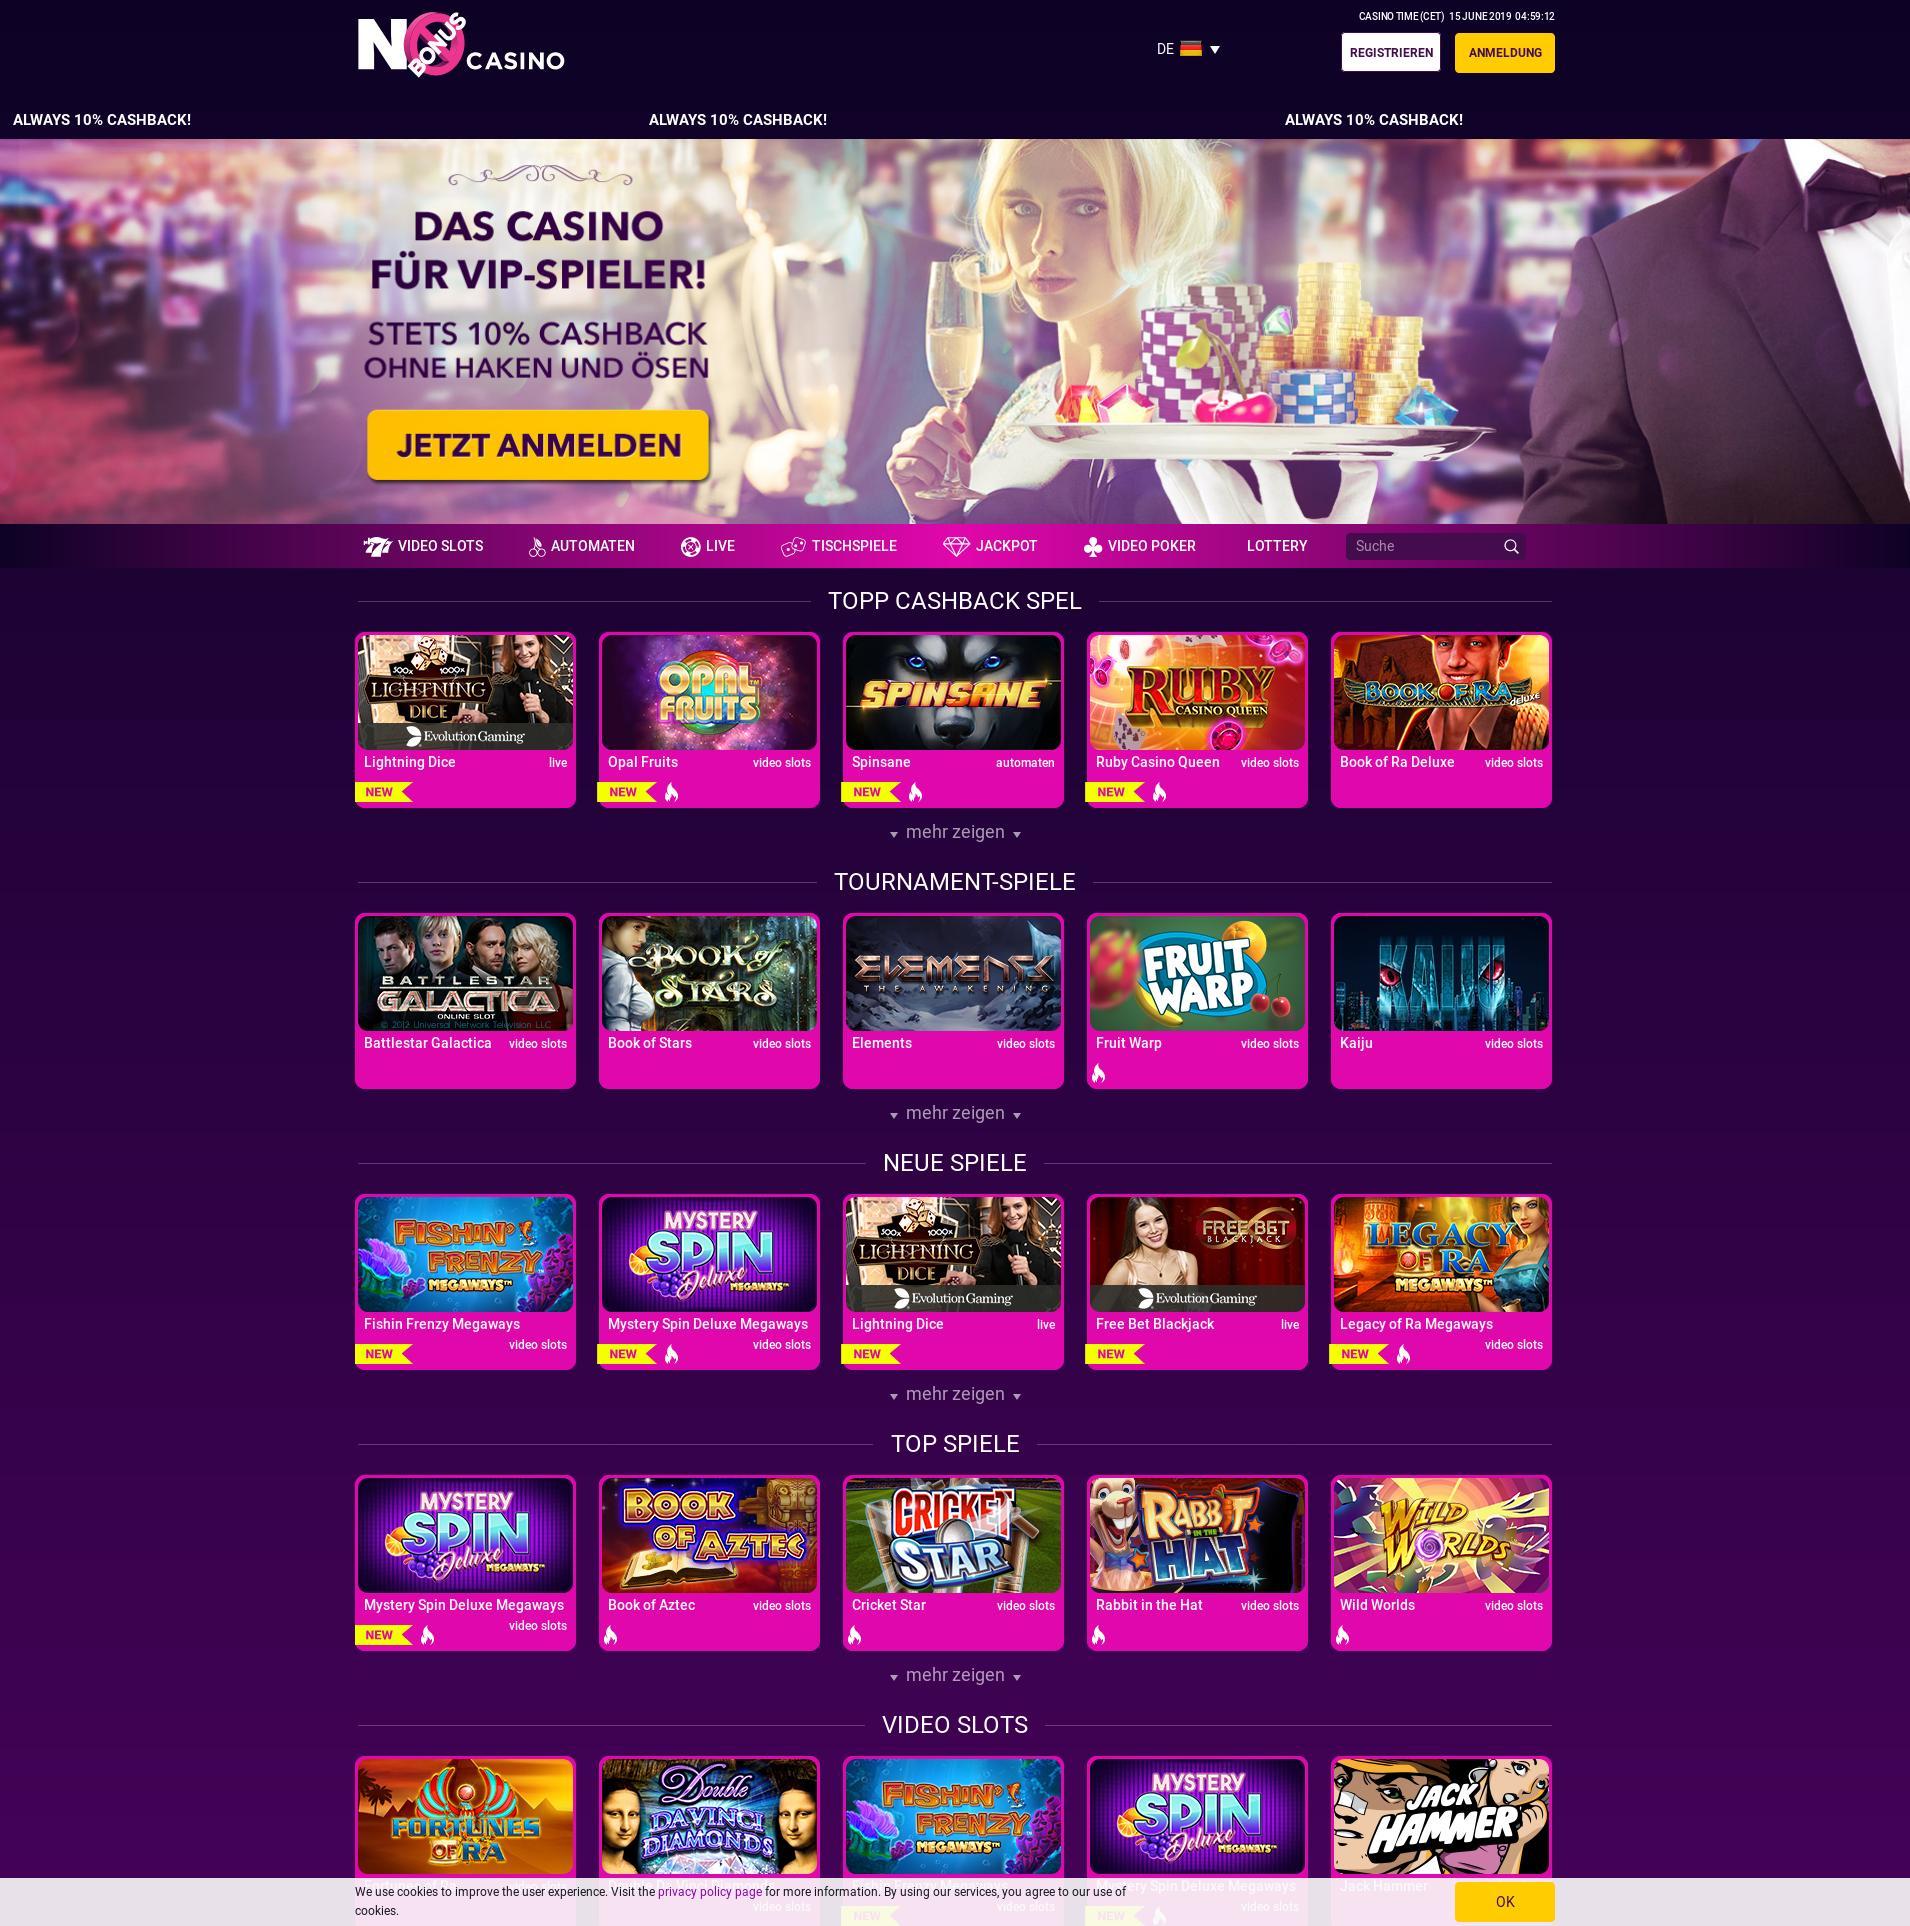 Casino screen Lobby 2019-06-15 for Germany